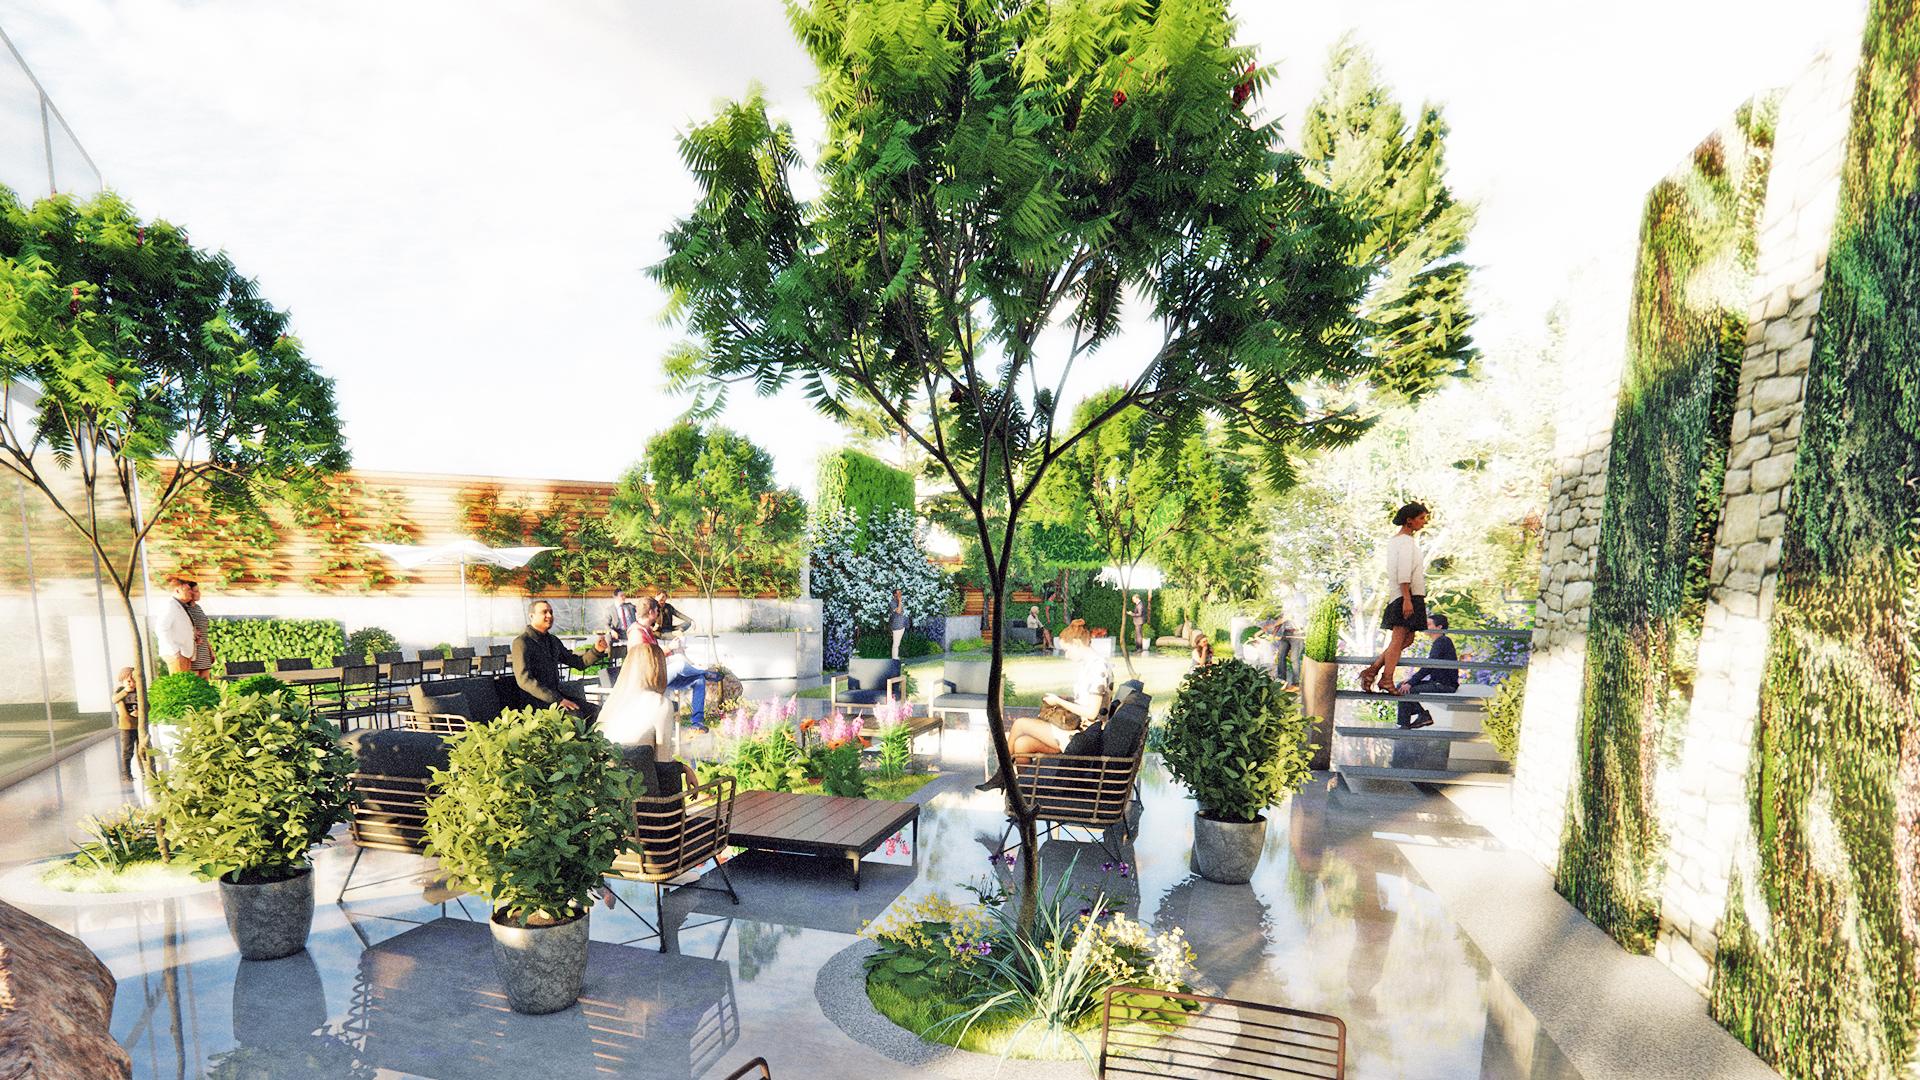 North London Garden • CONCEPT Landscape Architects, Urban ...